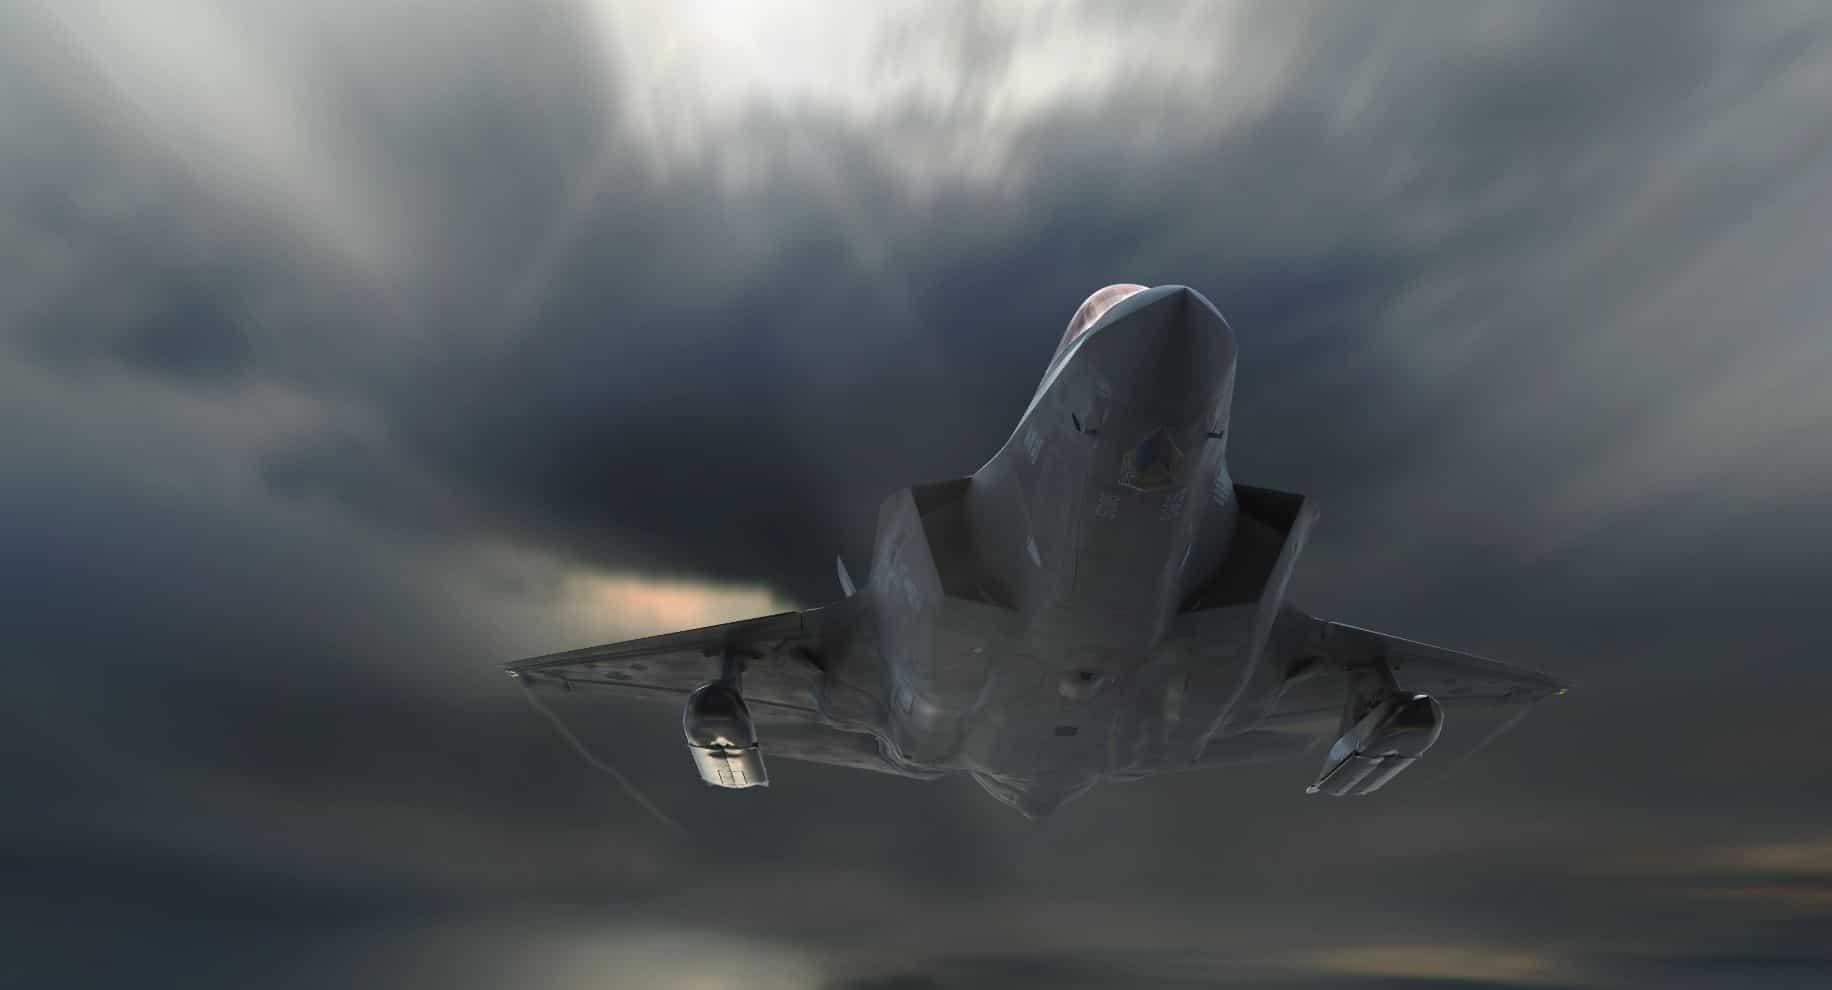 F-35-LRASM-Lockheed-Martin.jpg